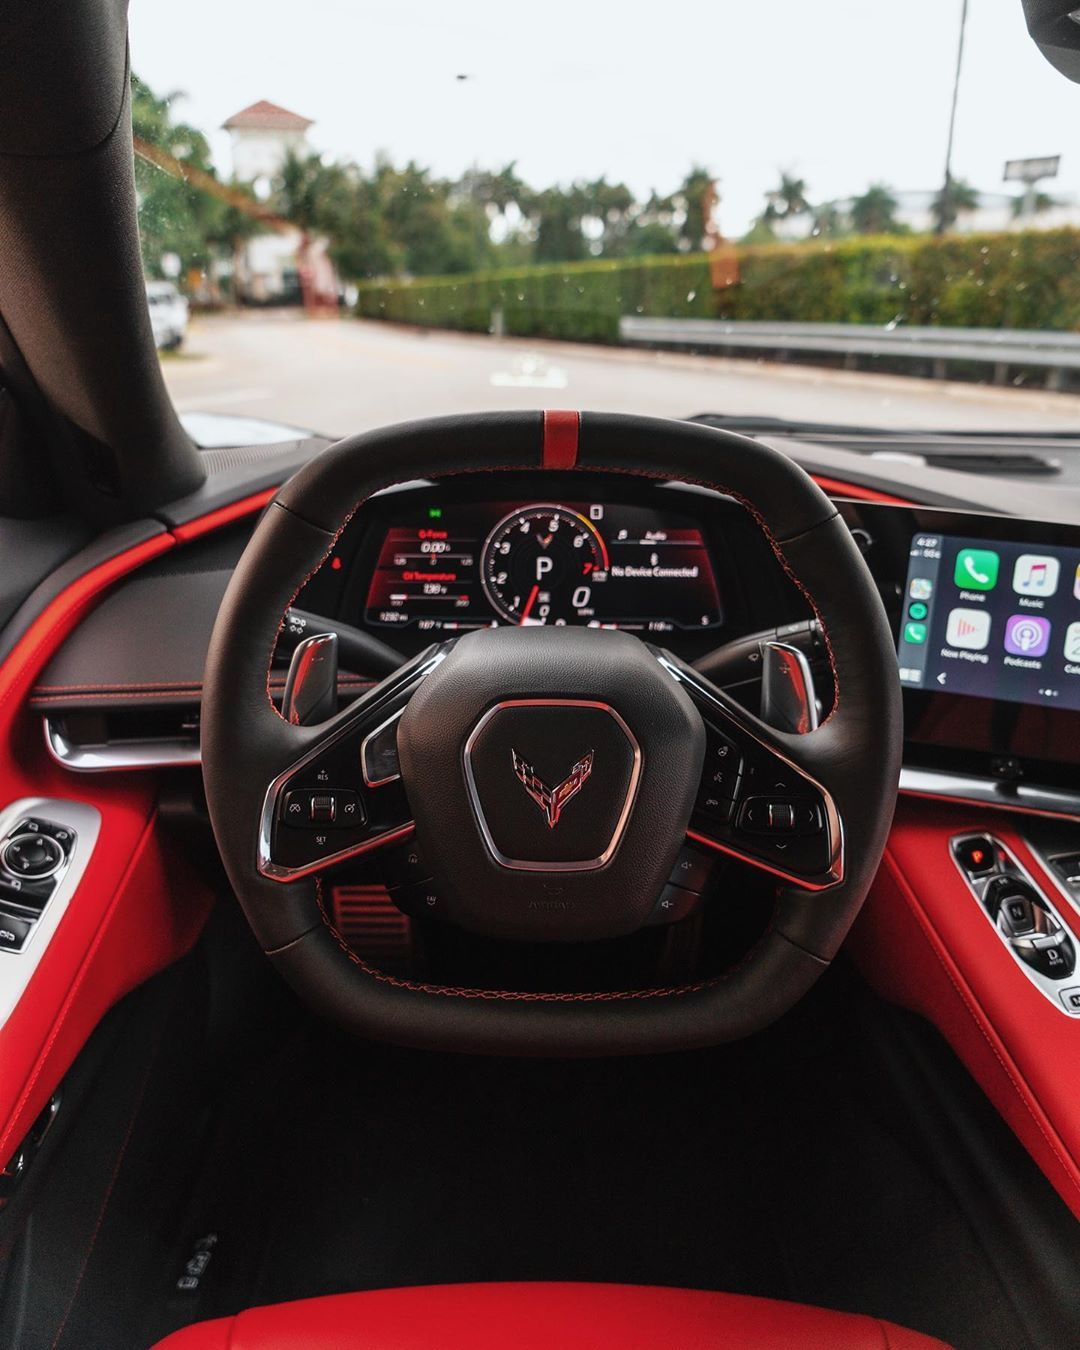 Gabe Florido On Instagram Some Photos Of The C8 Interior Adrenaline Red Corvettec8 C8 In 2020 Chevrolet Corvette Stingray Corvette Convertible Corvette Stingray